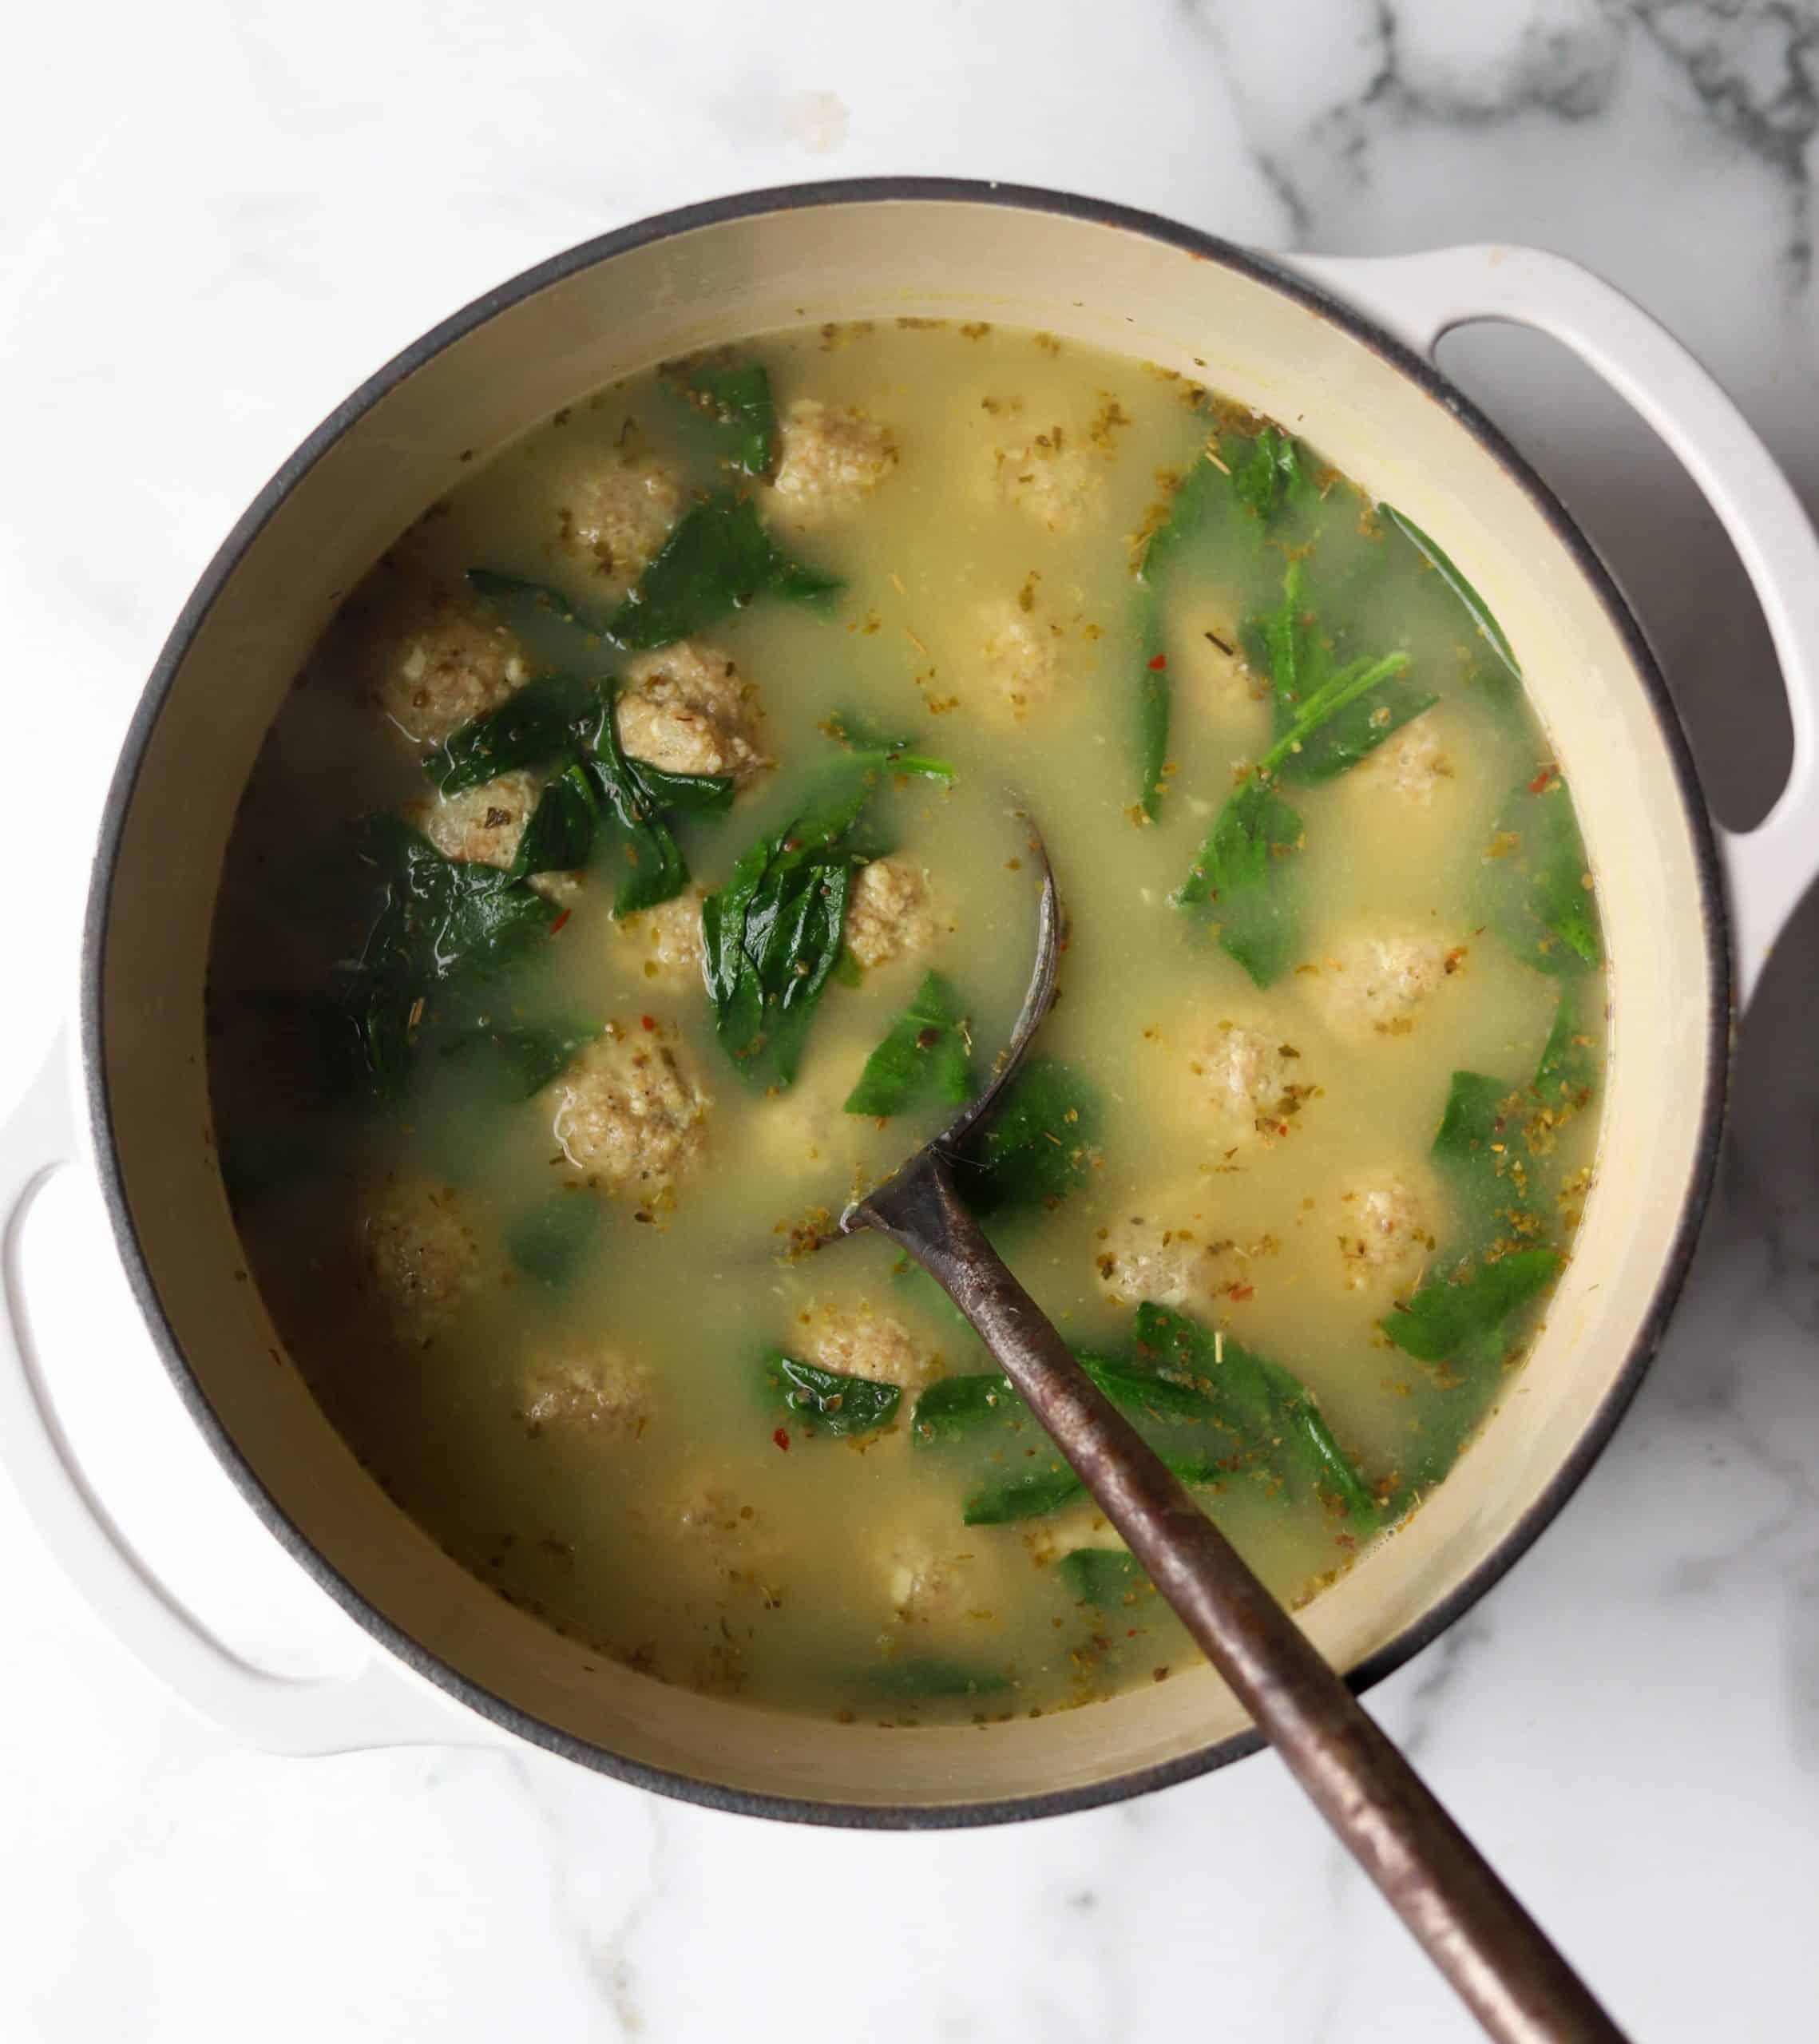 Italian wedding soup in a white bowl